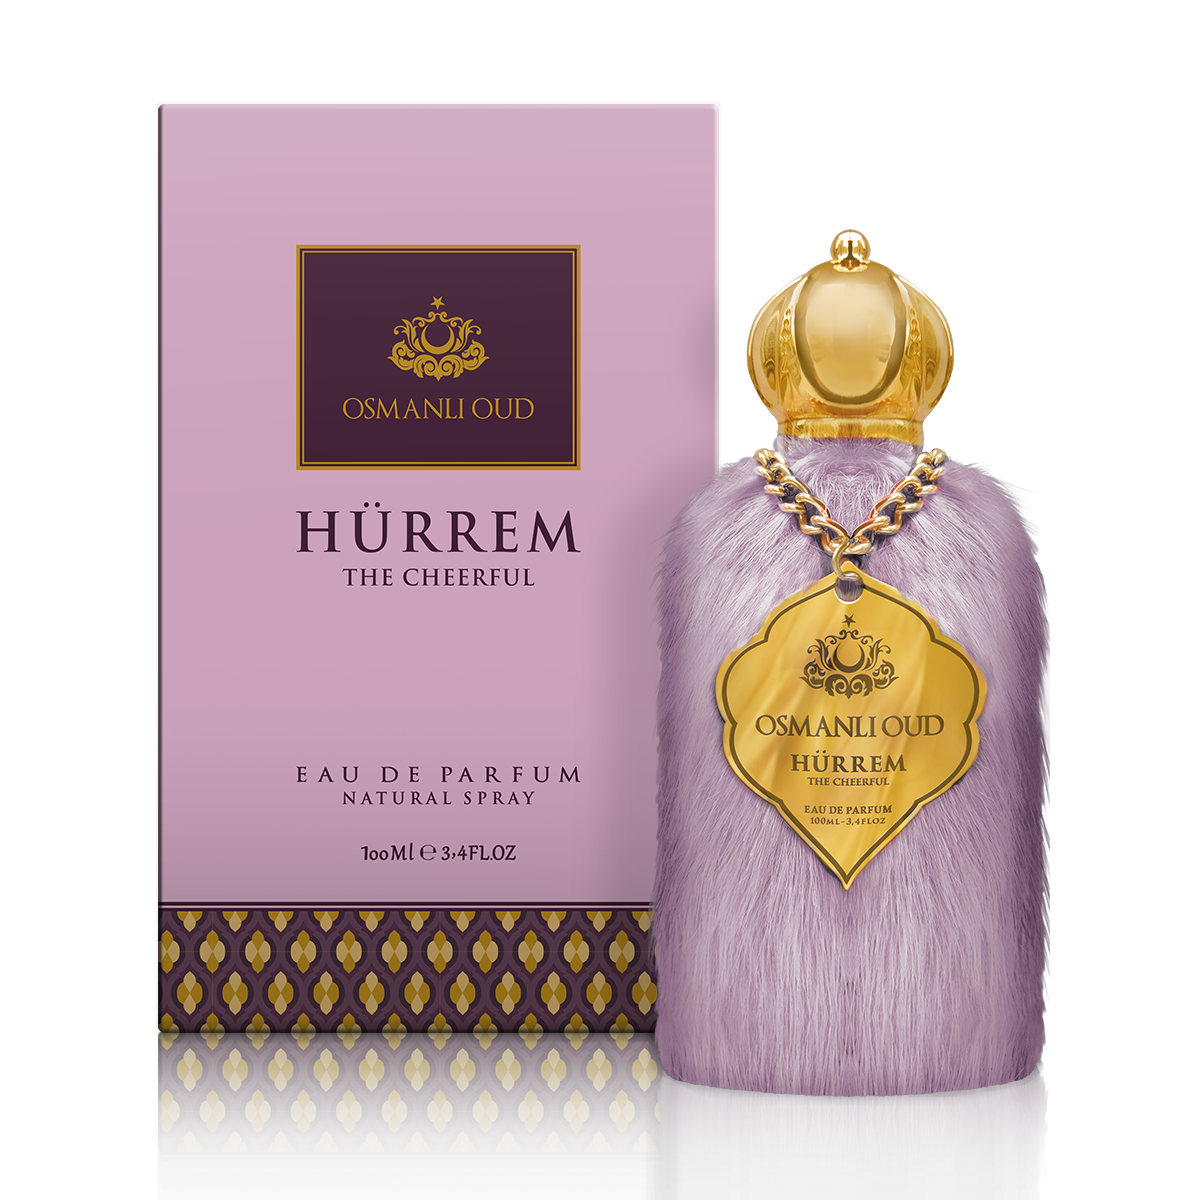 Hurrem the cheerful EDP Perfume 100 ML